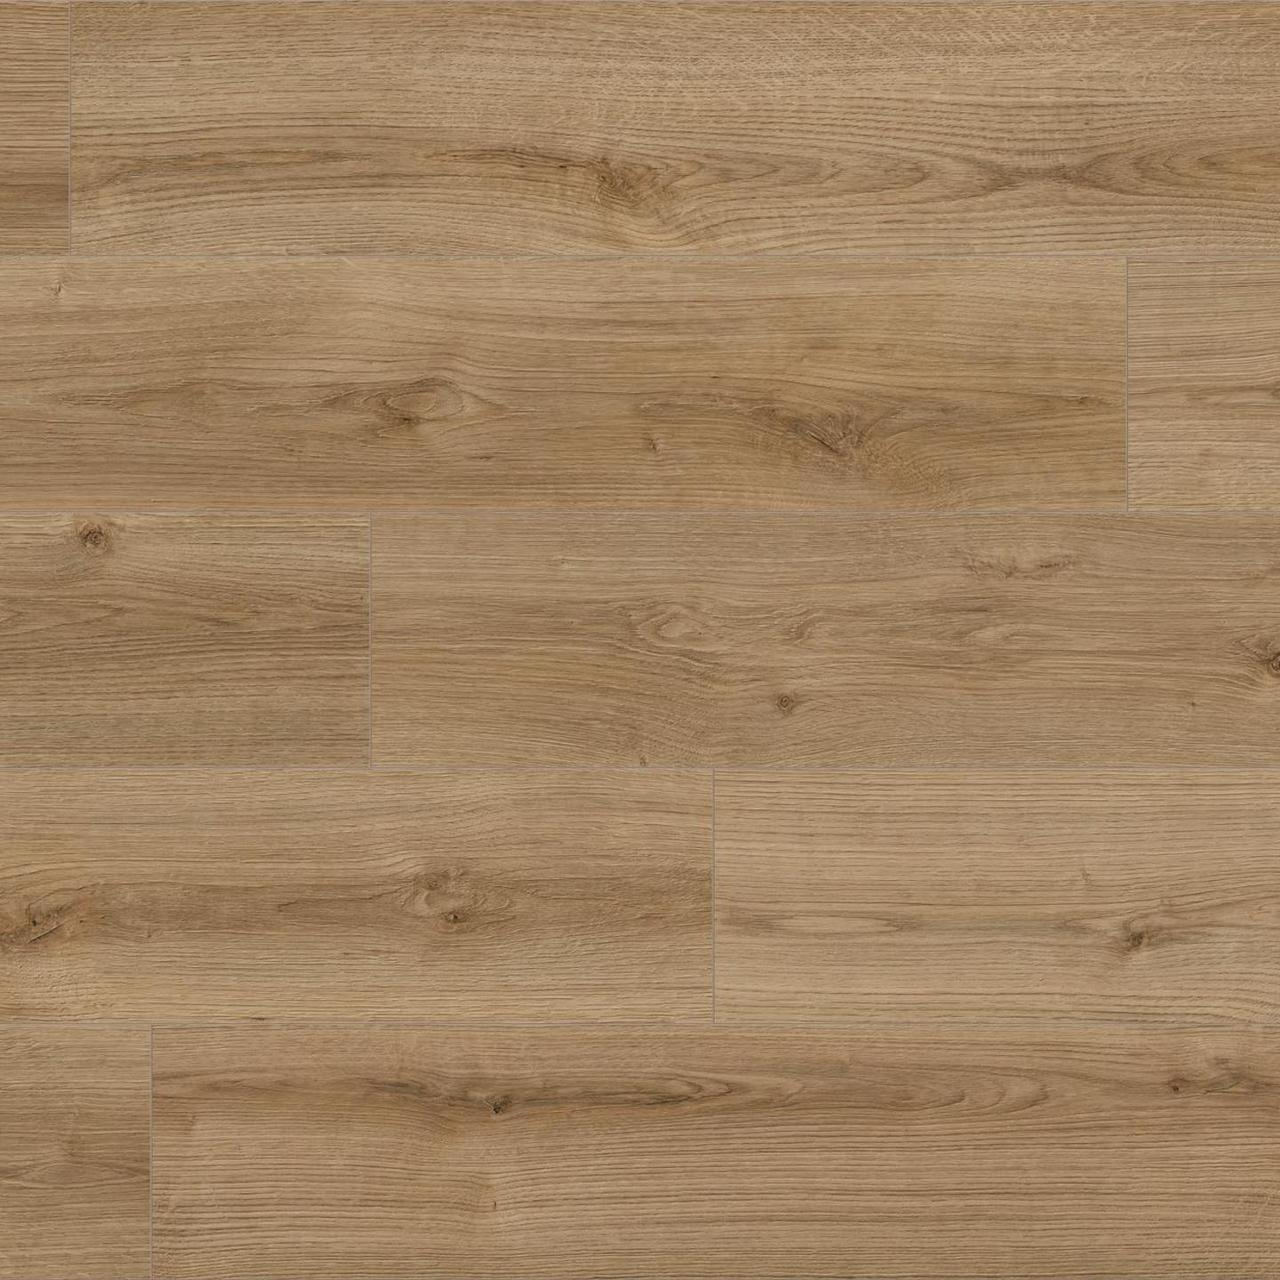 Ламинат Kaindl, Natural Touch, цвет Дуб Ивоук Тренд, К4421